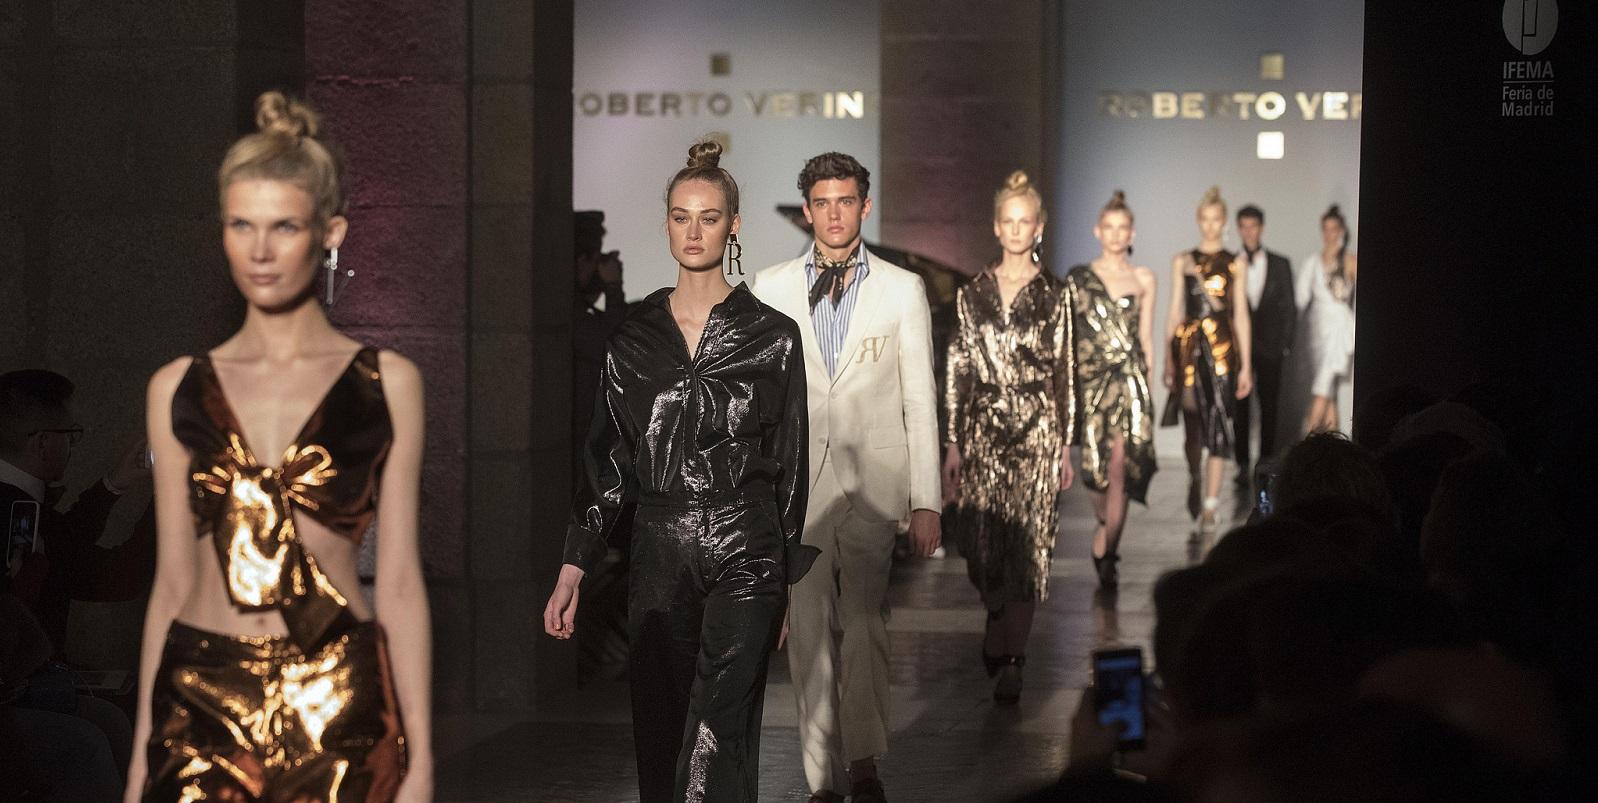 Le Top 5 de la mode en Espagne : Il n'y a pas que Zara